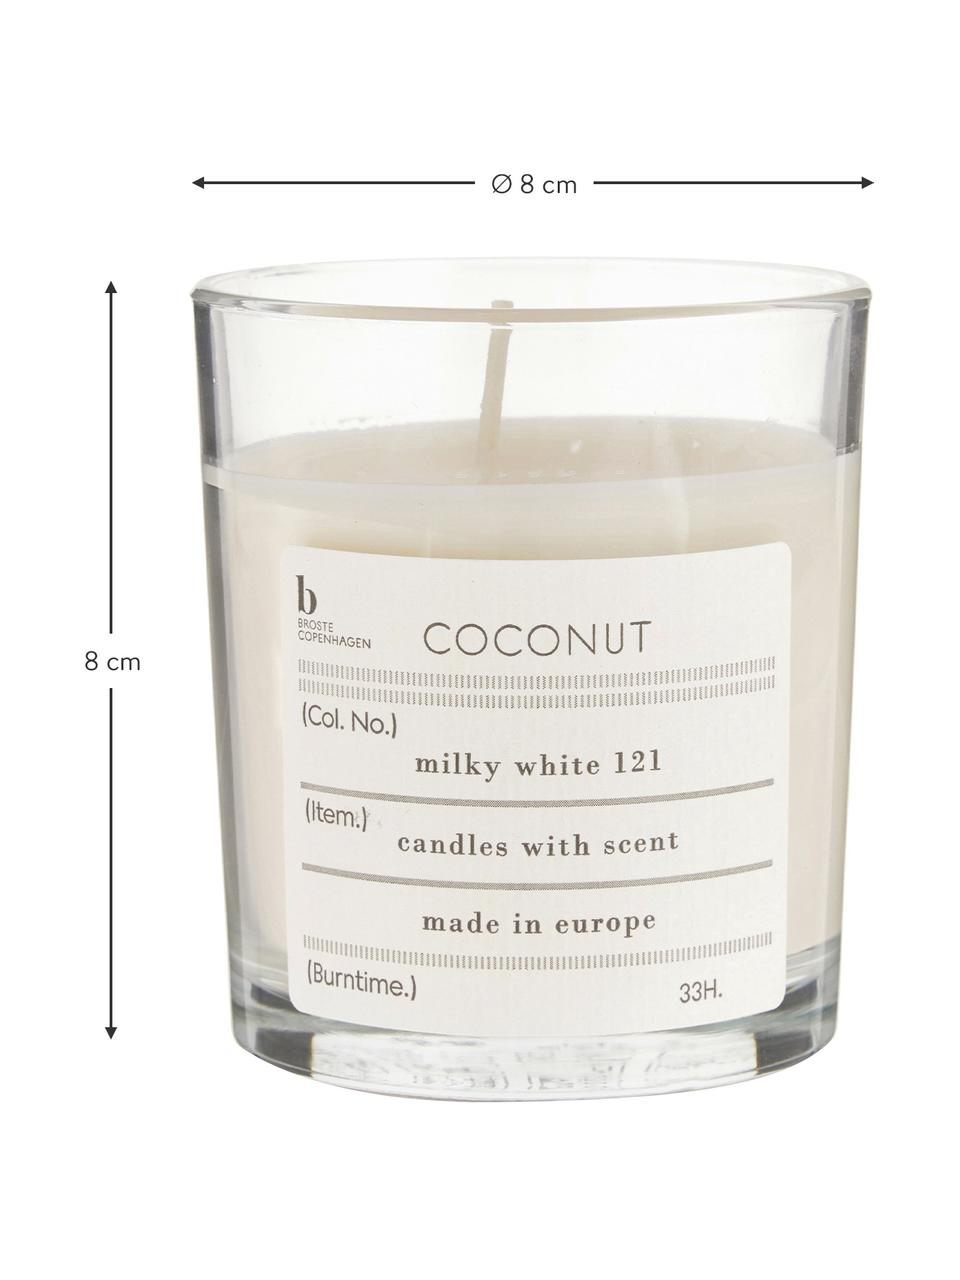 Duftkerze Bliss (Kokosnuss), Natürliches Sojawachs, Glas, Kokosnuss, Ø 8 x H 8 cm